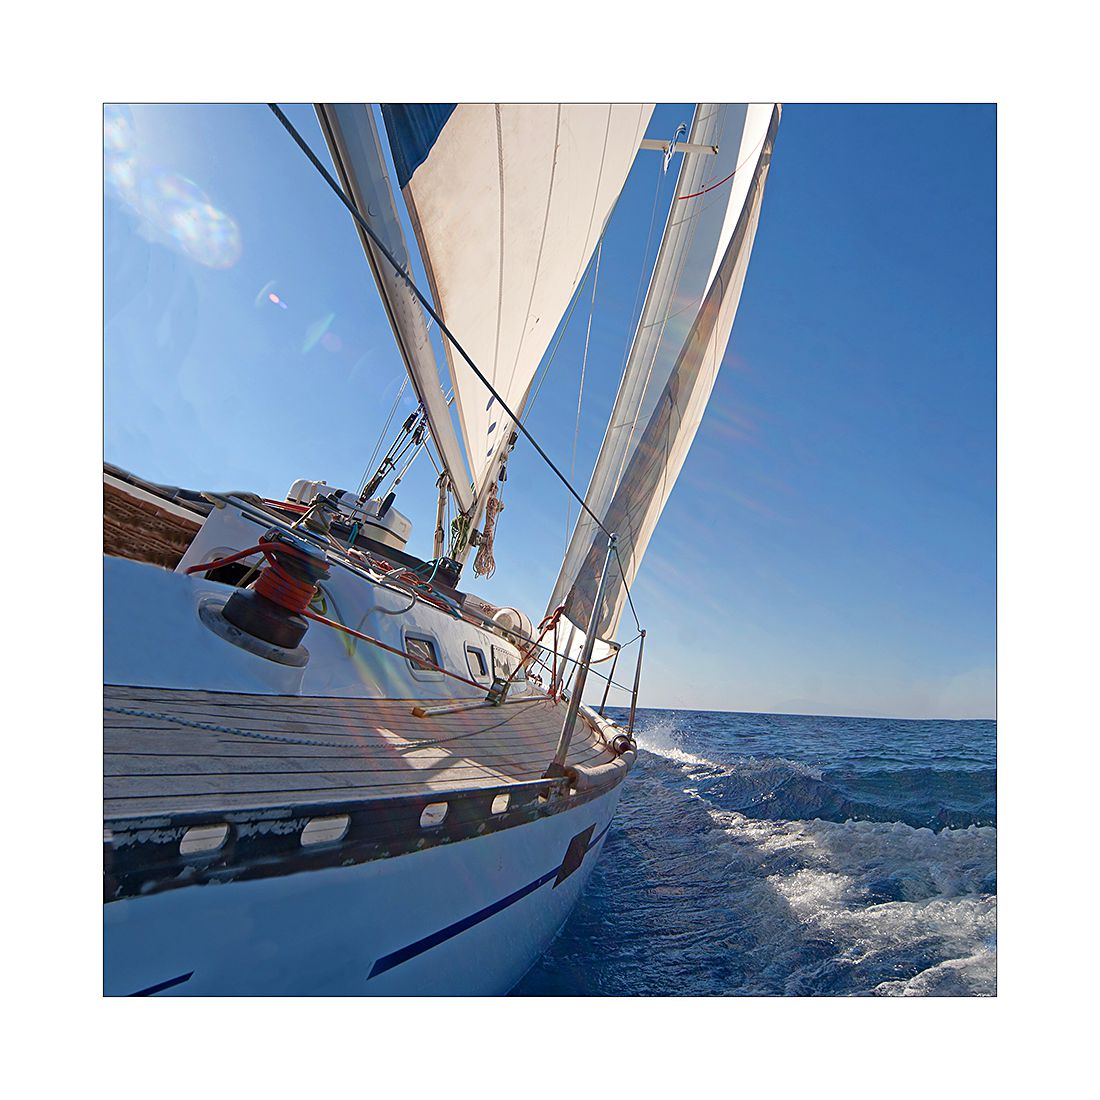 Kunstdruk sailing trip I - 20x20cm, Pro Art